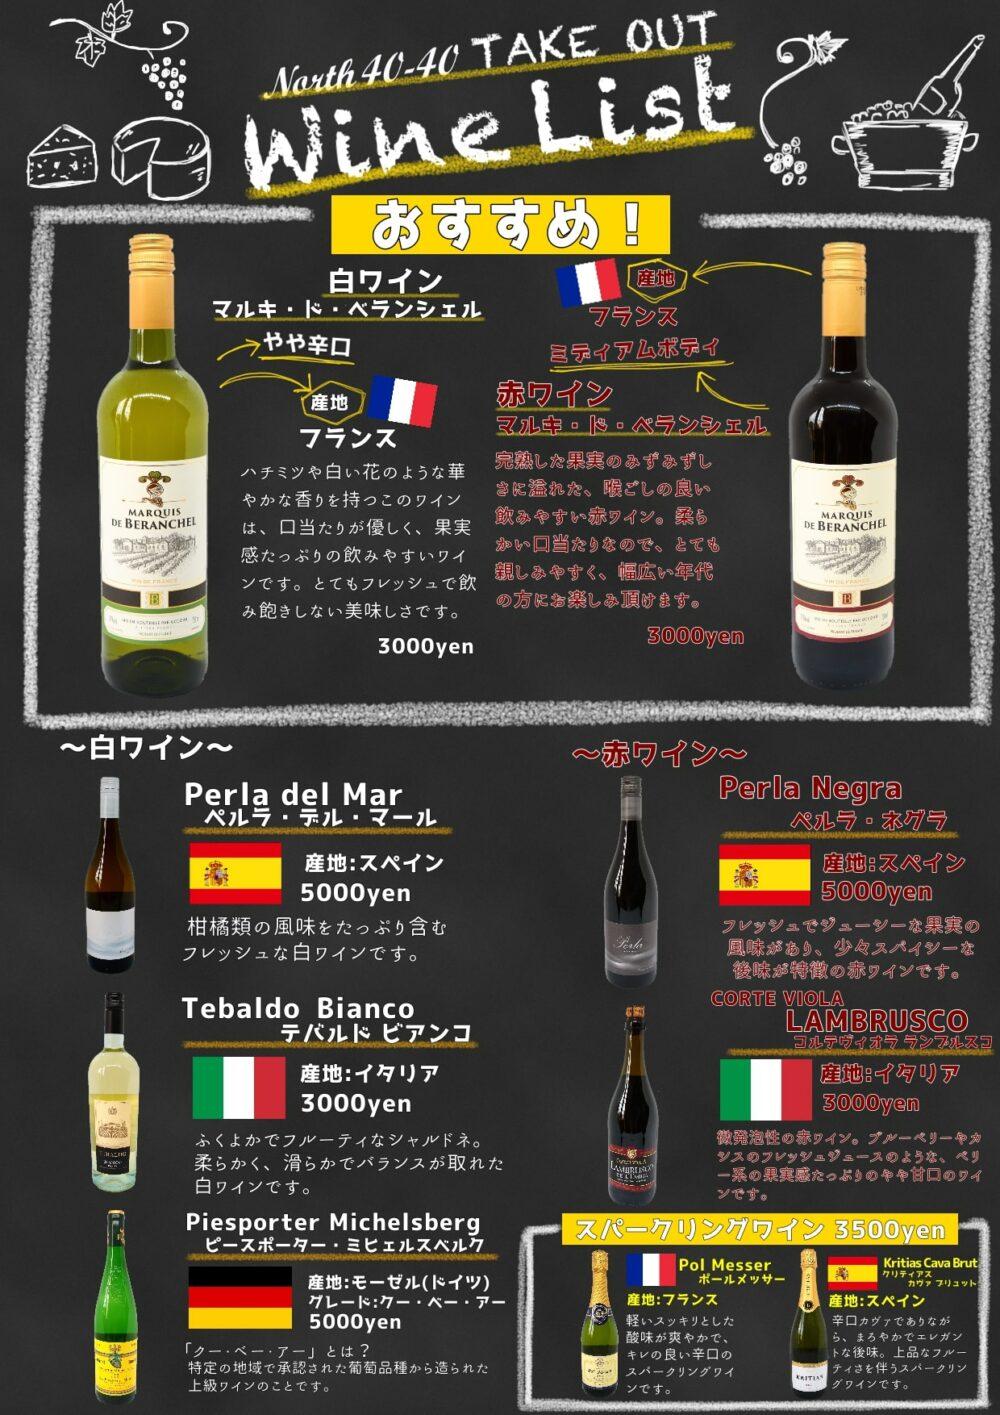 【Wine List for togo】テイクアウトワイン